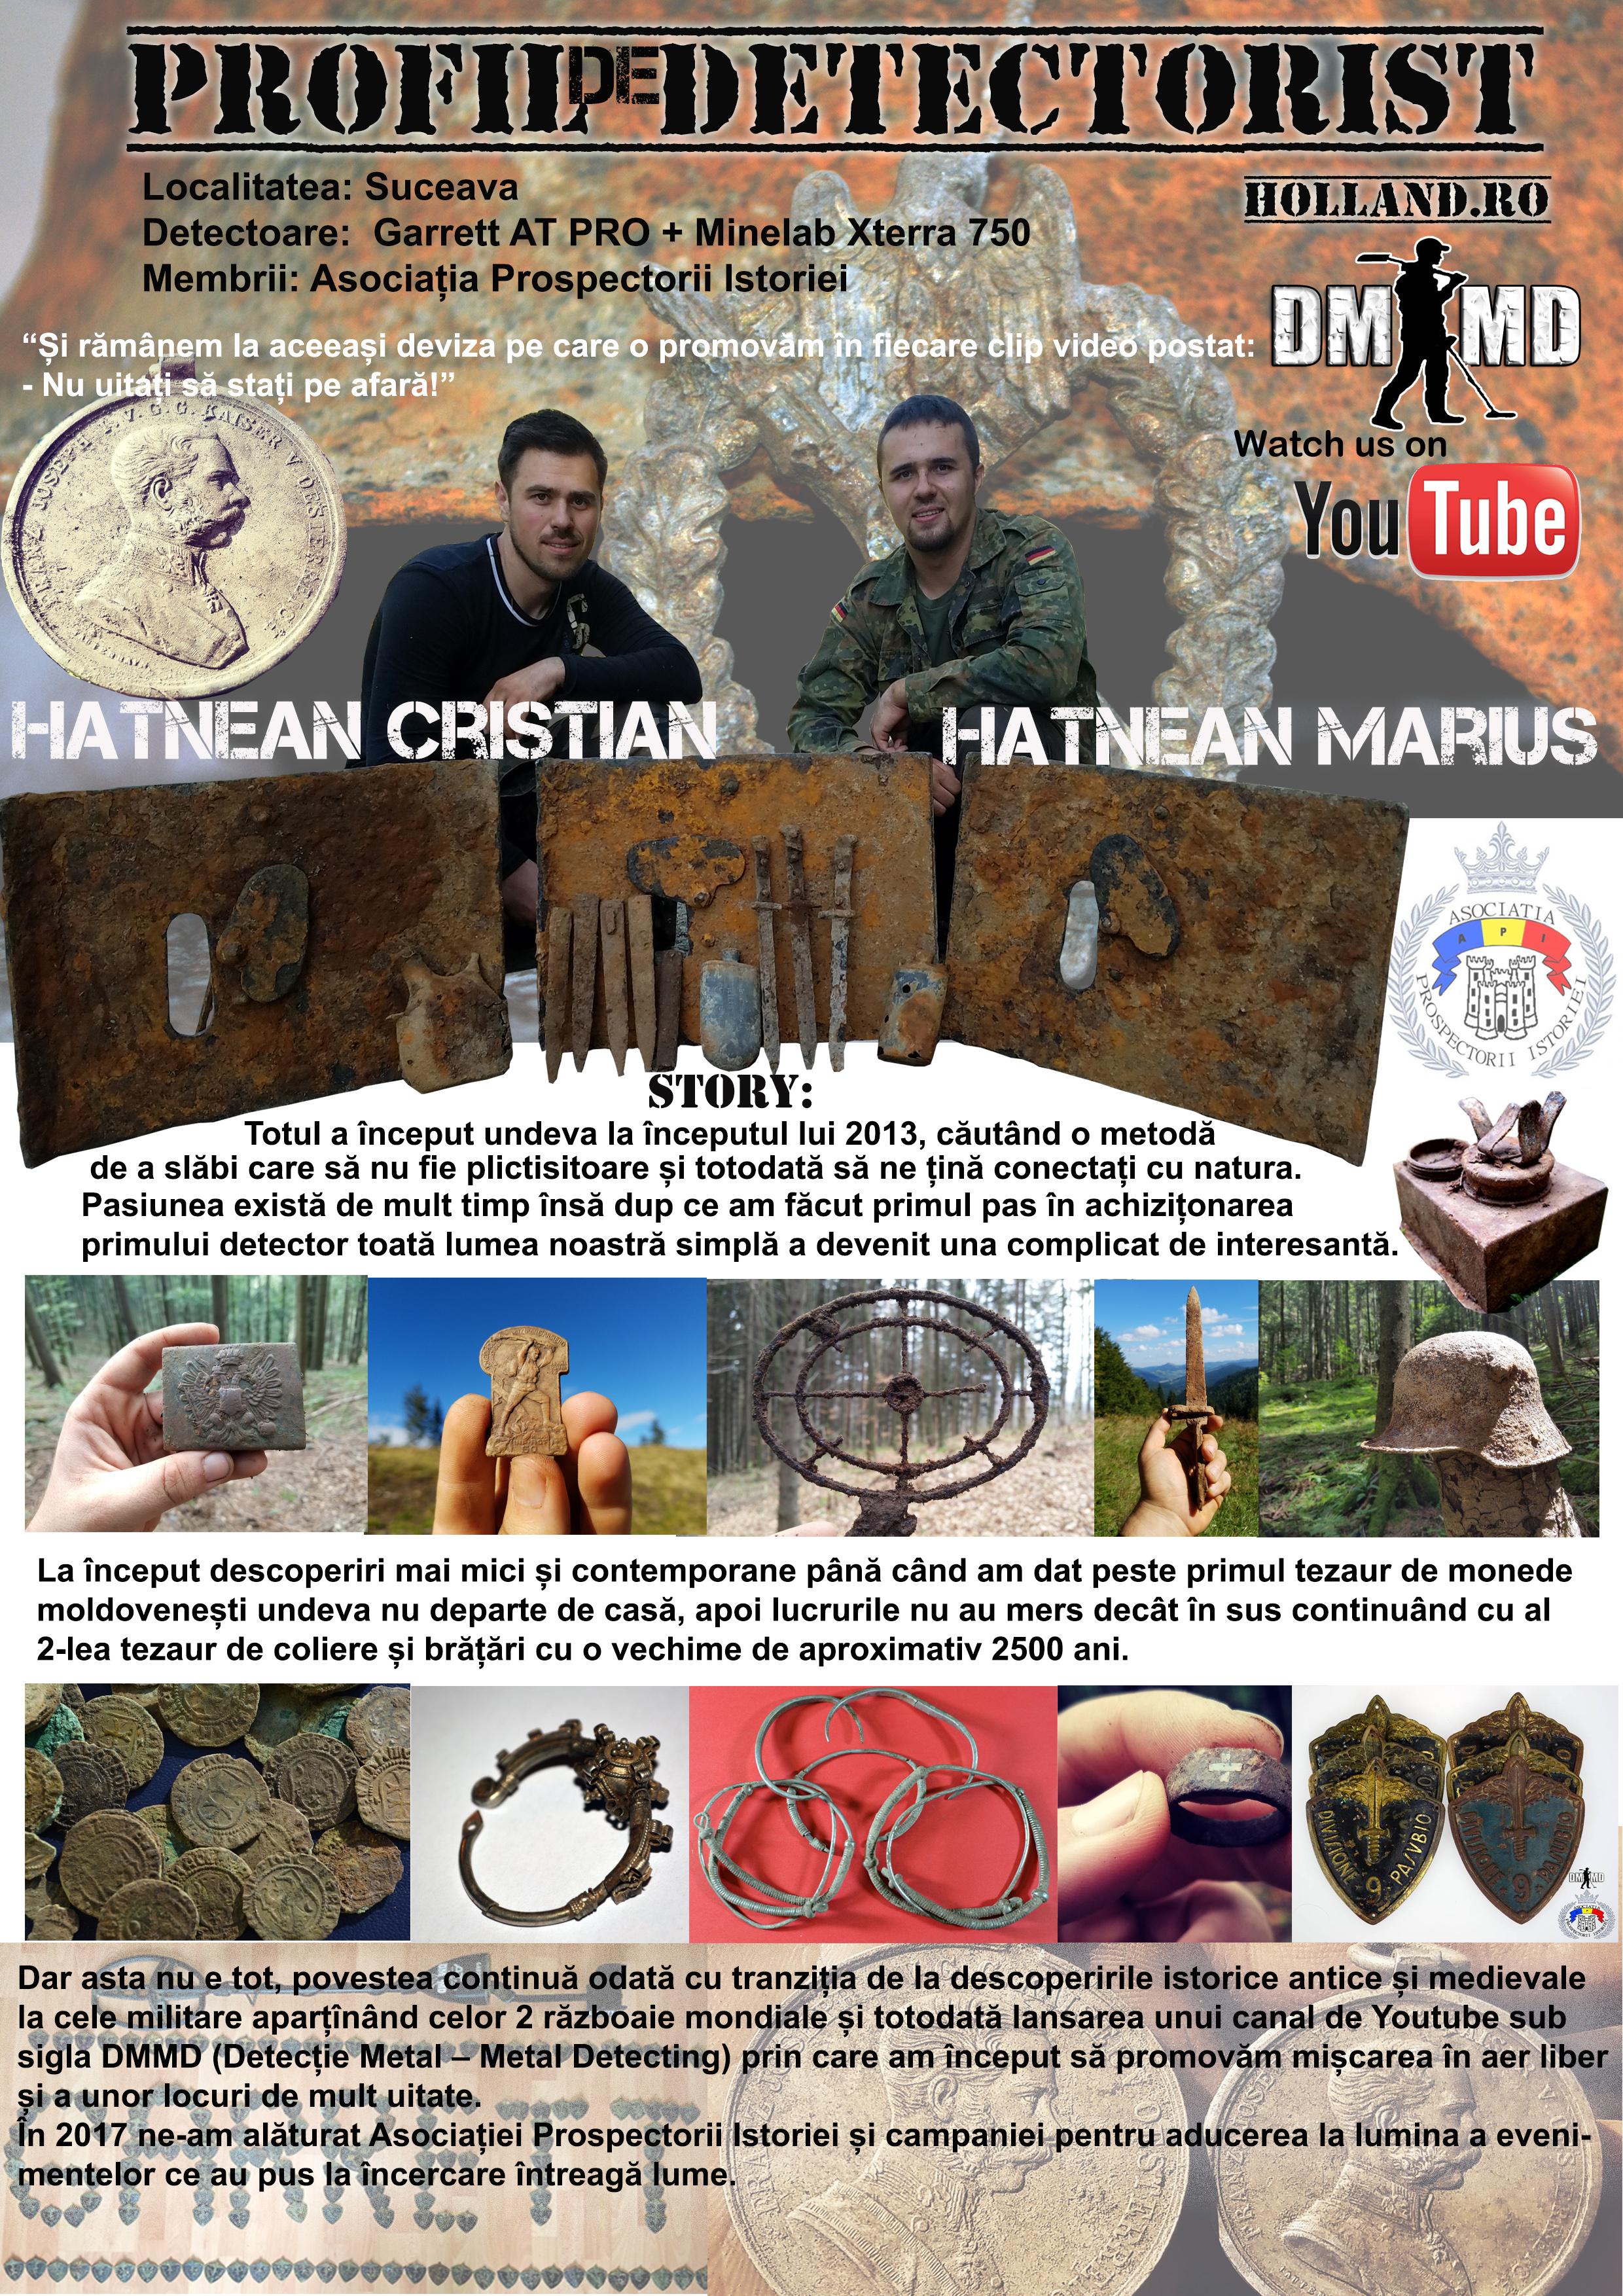 Profil de Detectorist – Fratii Hatnean